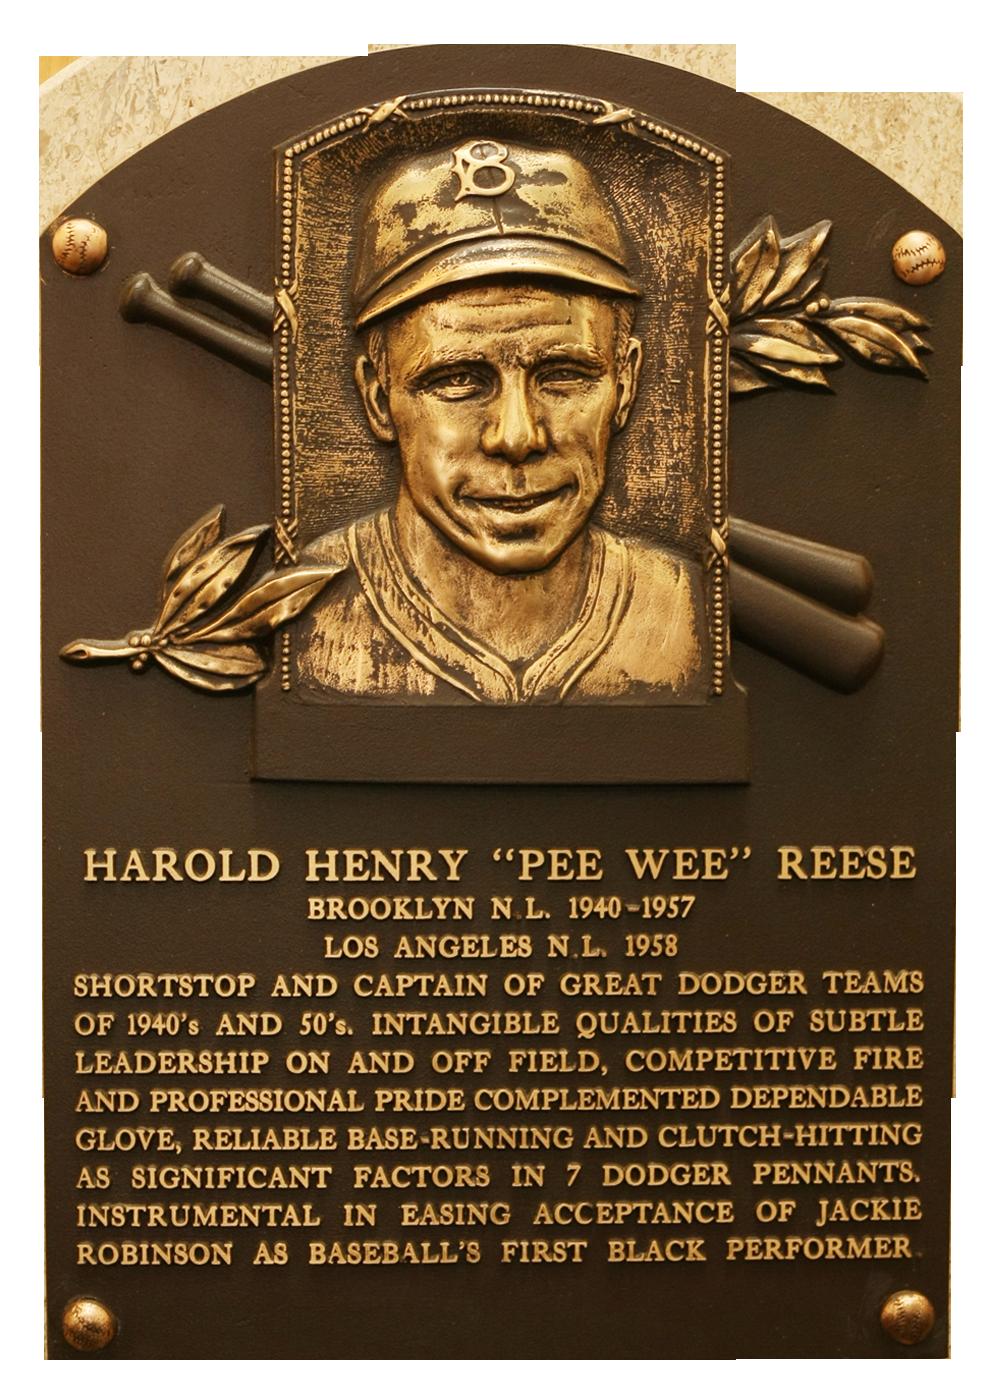 Reese Pee Wee Baseball Hall Of Fame